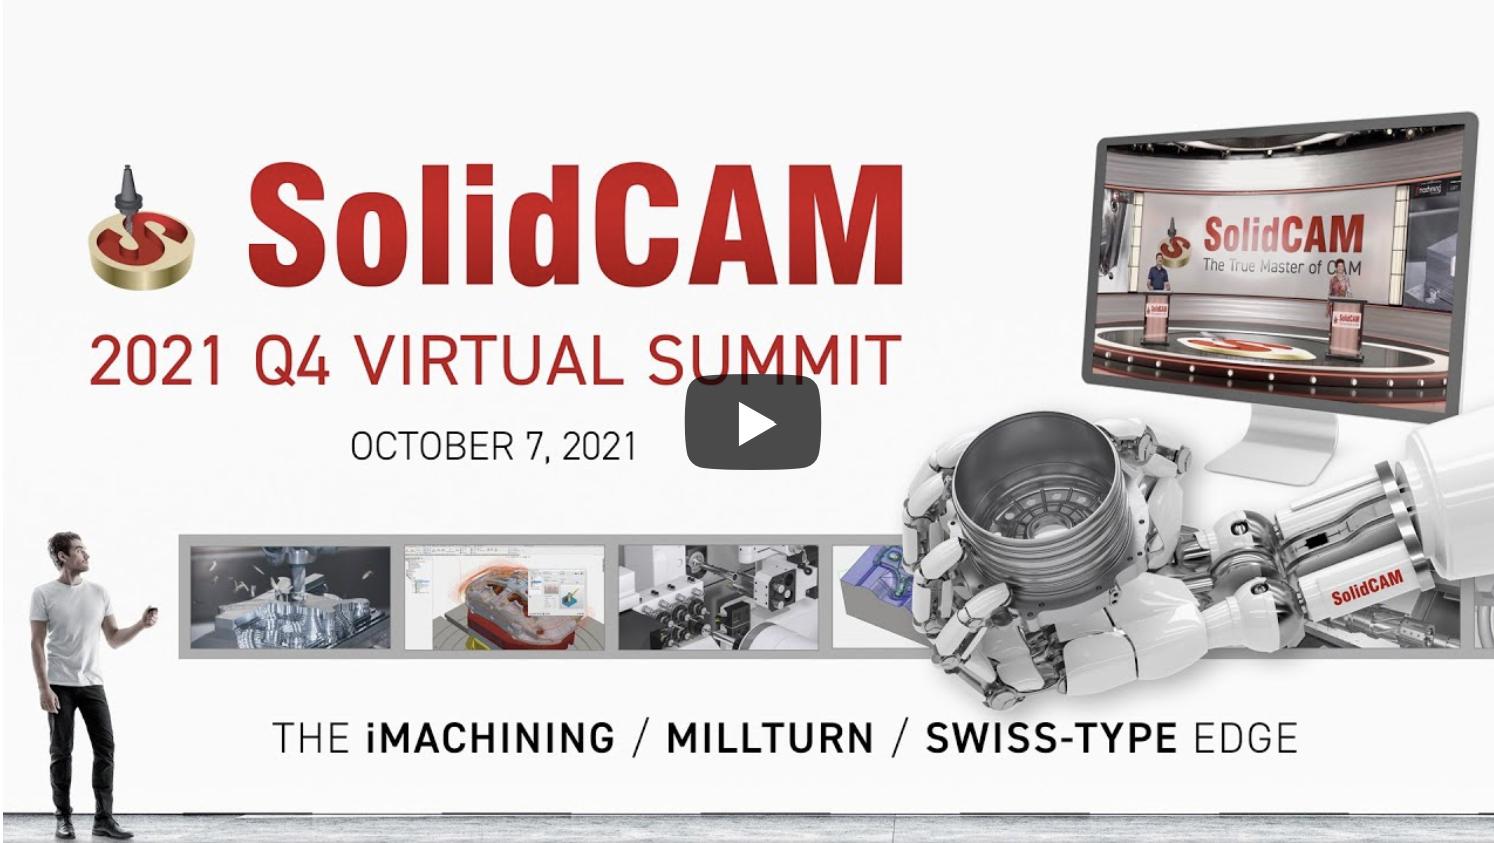 SolidCAM World 2021 online event